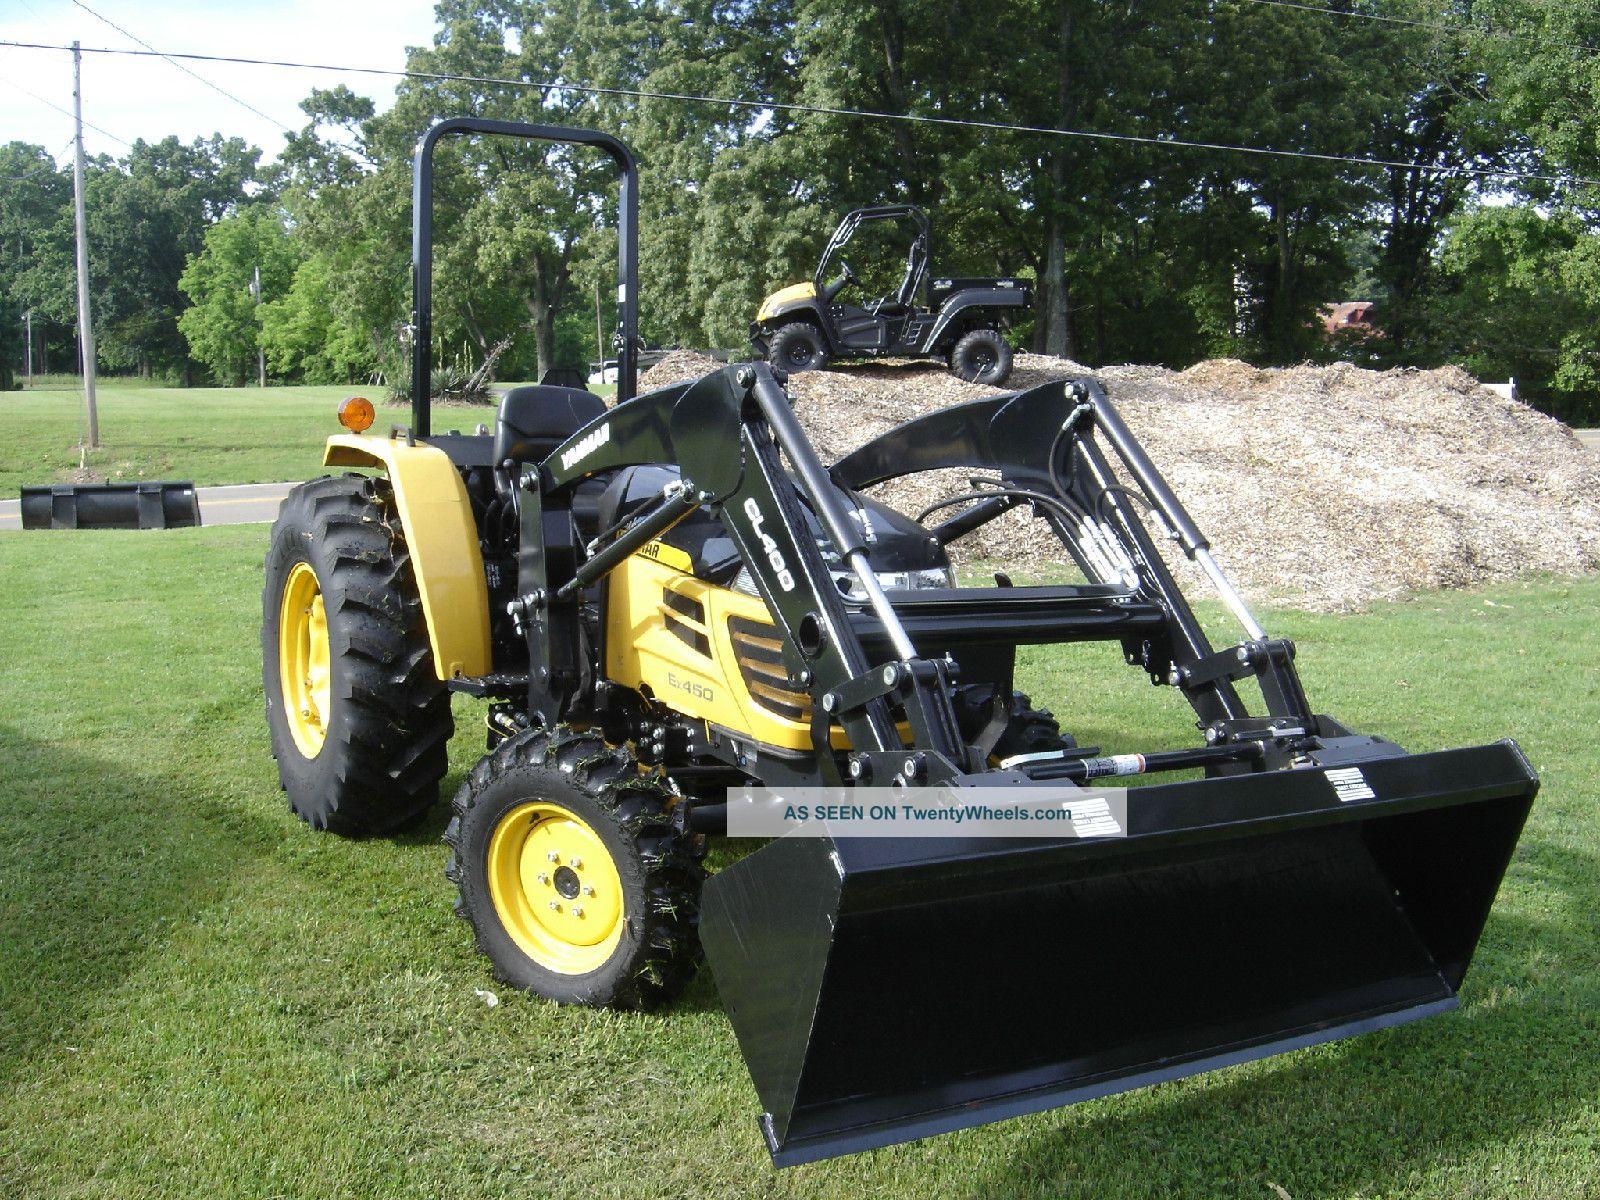 Cub Cadet Yanmar Ex450 Compact Utility Tractor Tractors photo 1